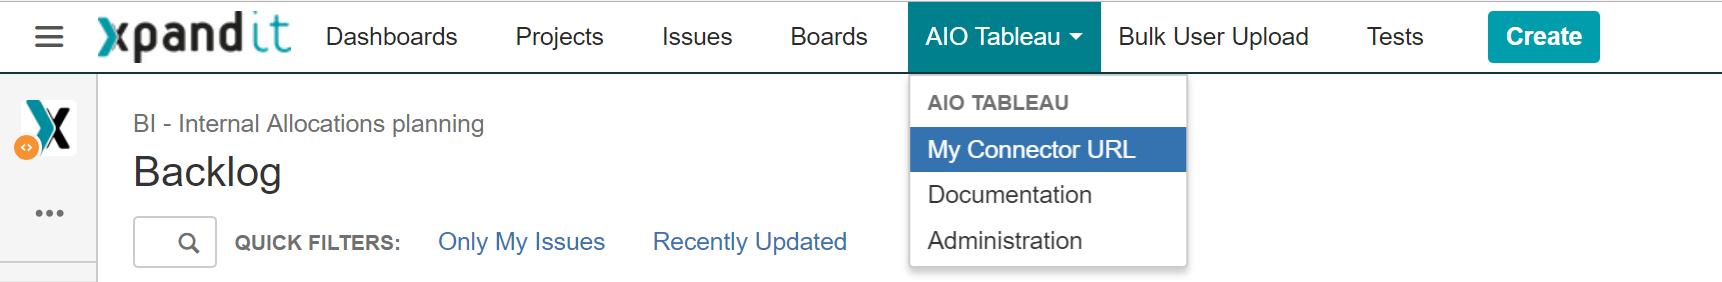 Azure Boards Documentation